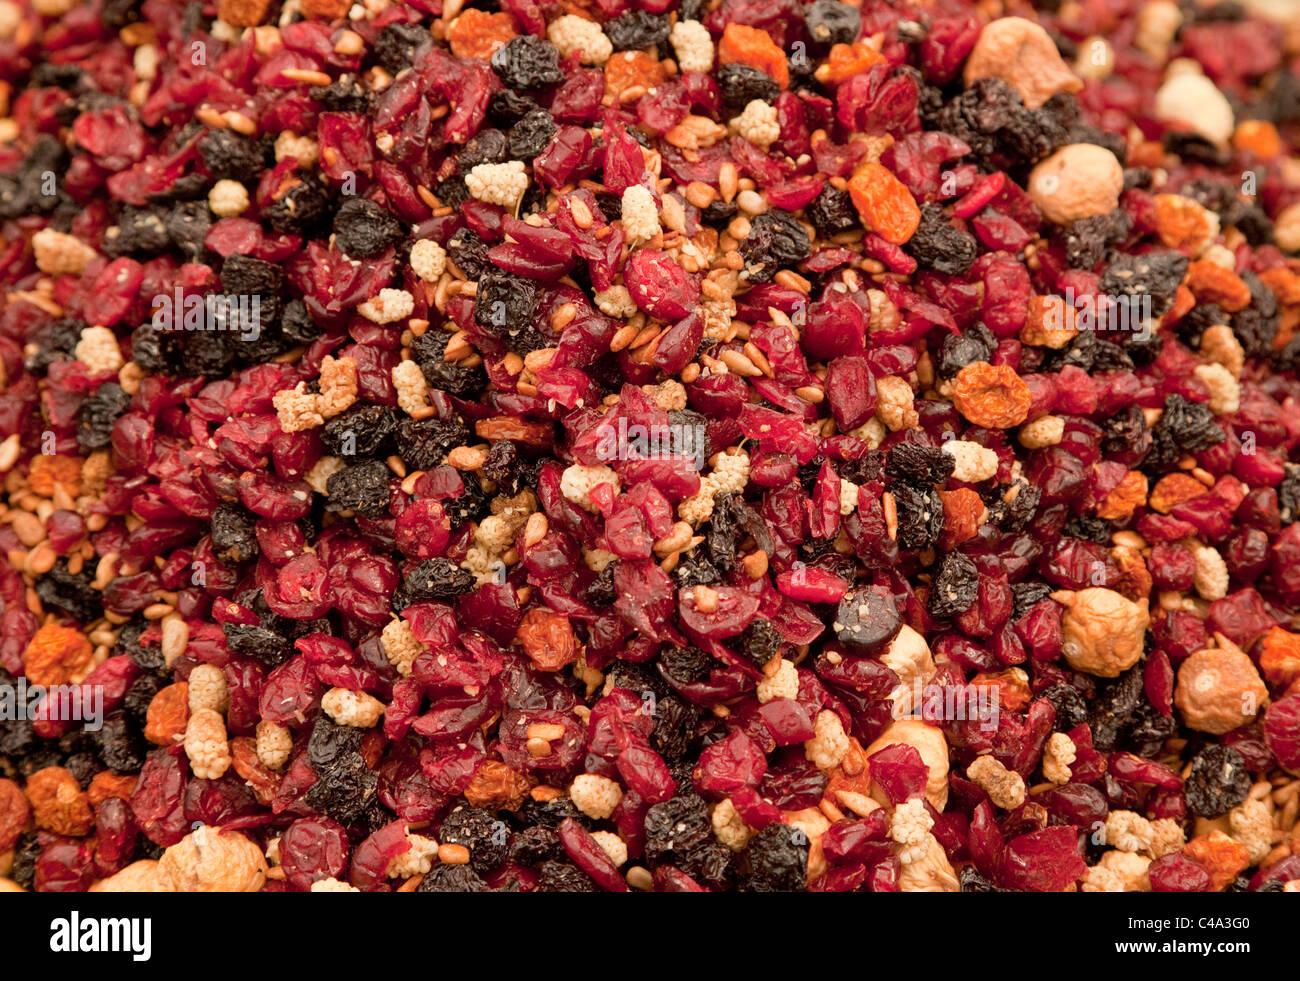 Dried fruit, mixed fruit - Trockenobst, Früchtemischung - Stock Image